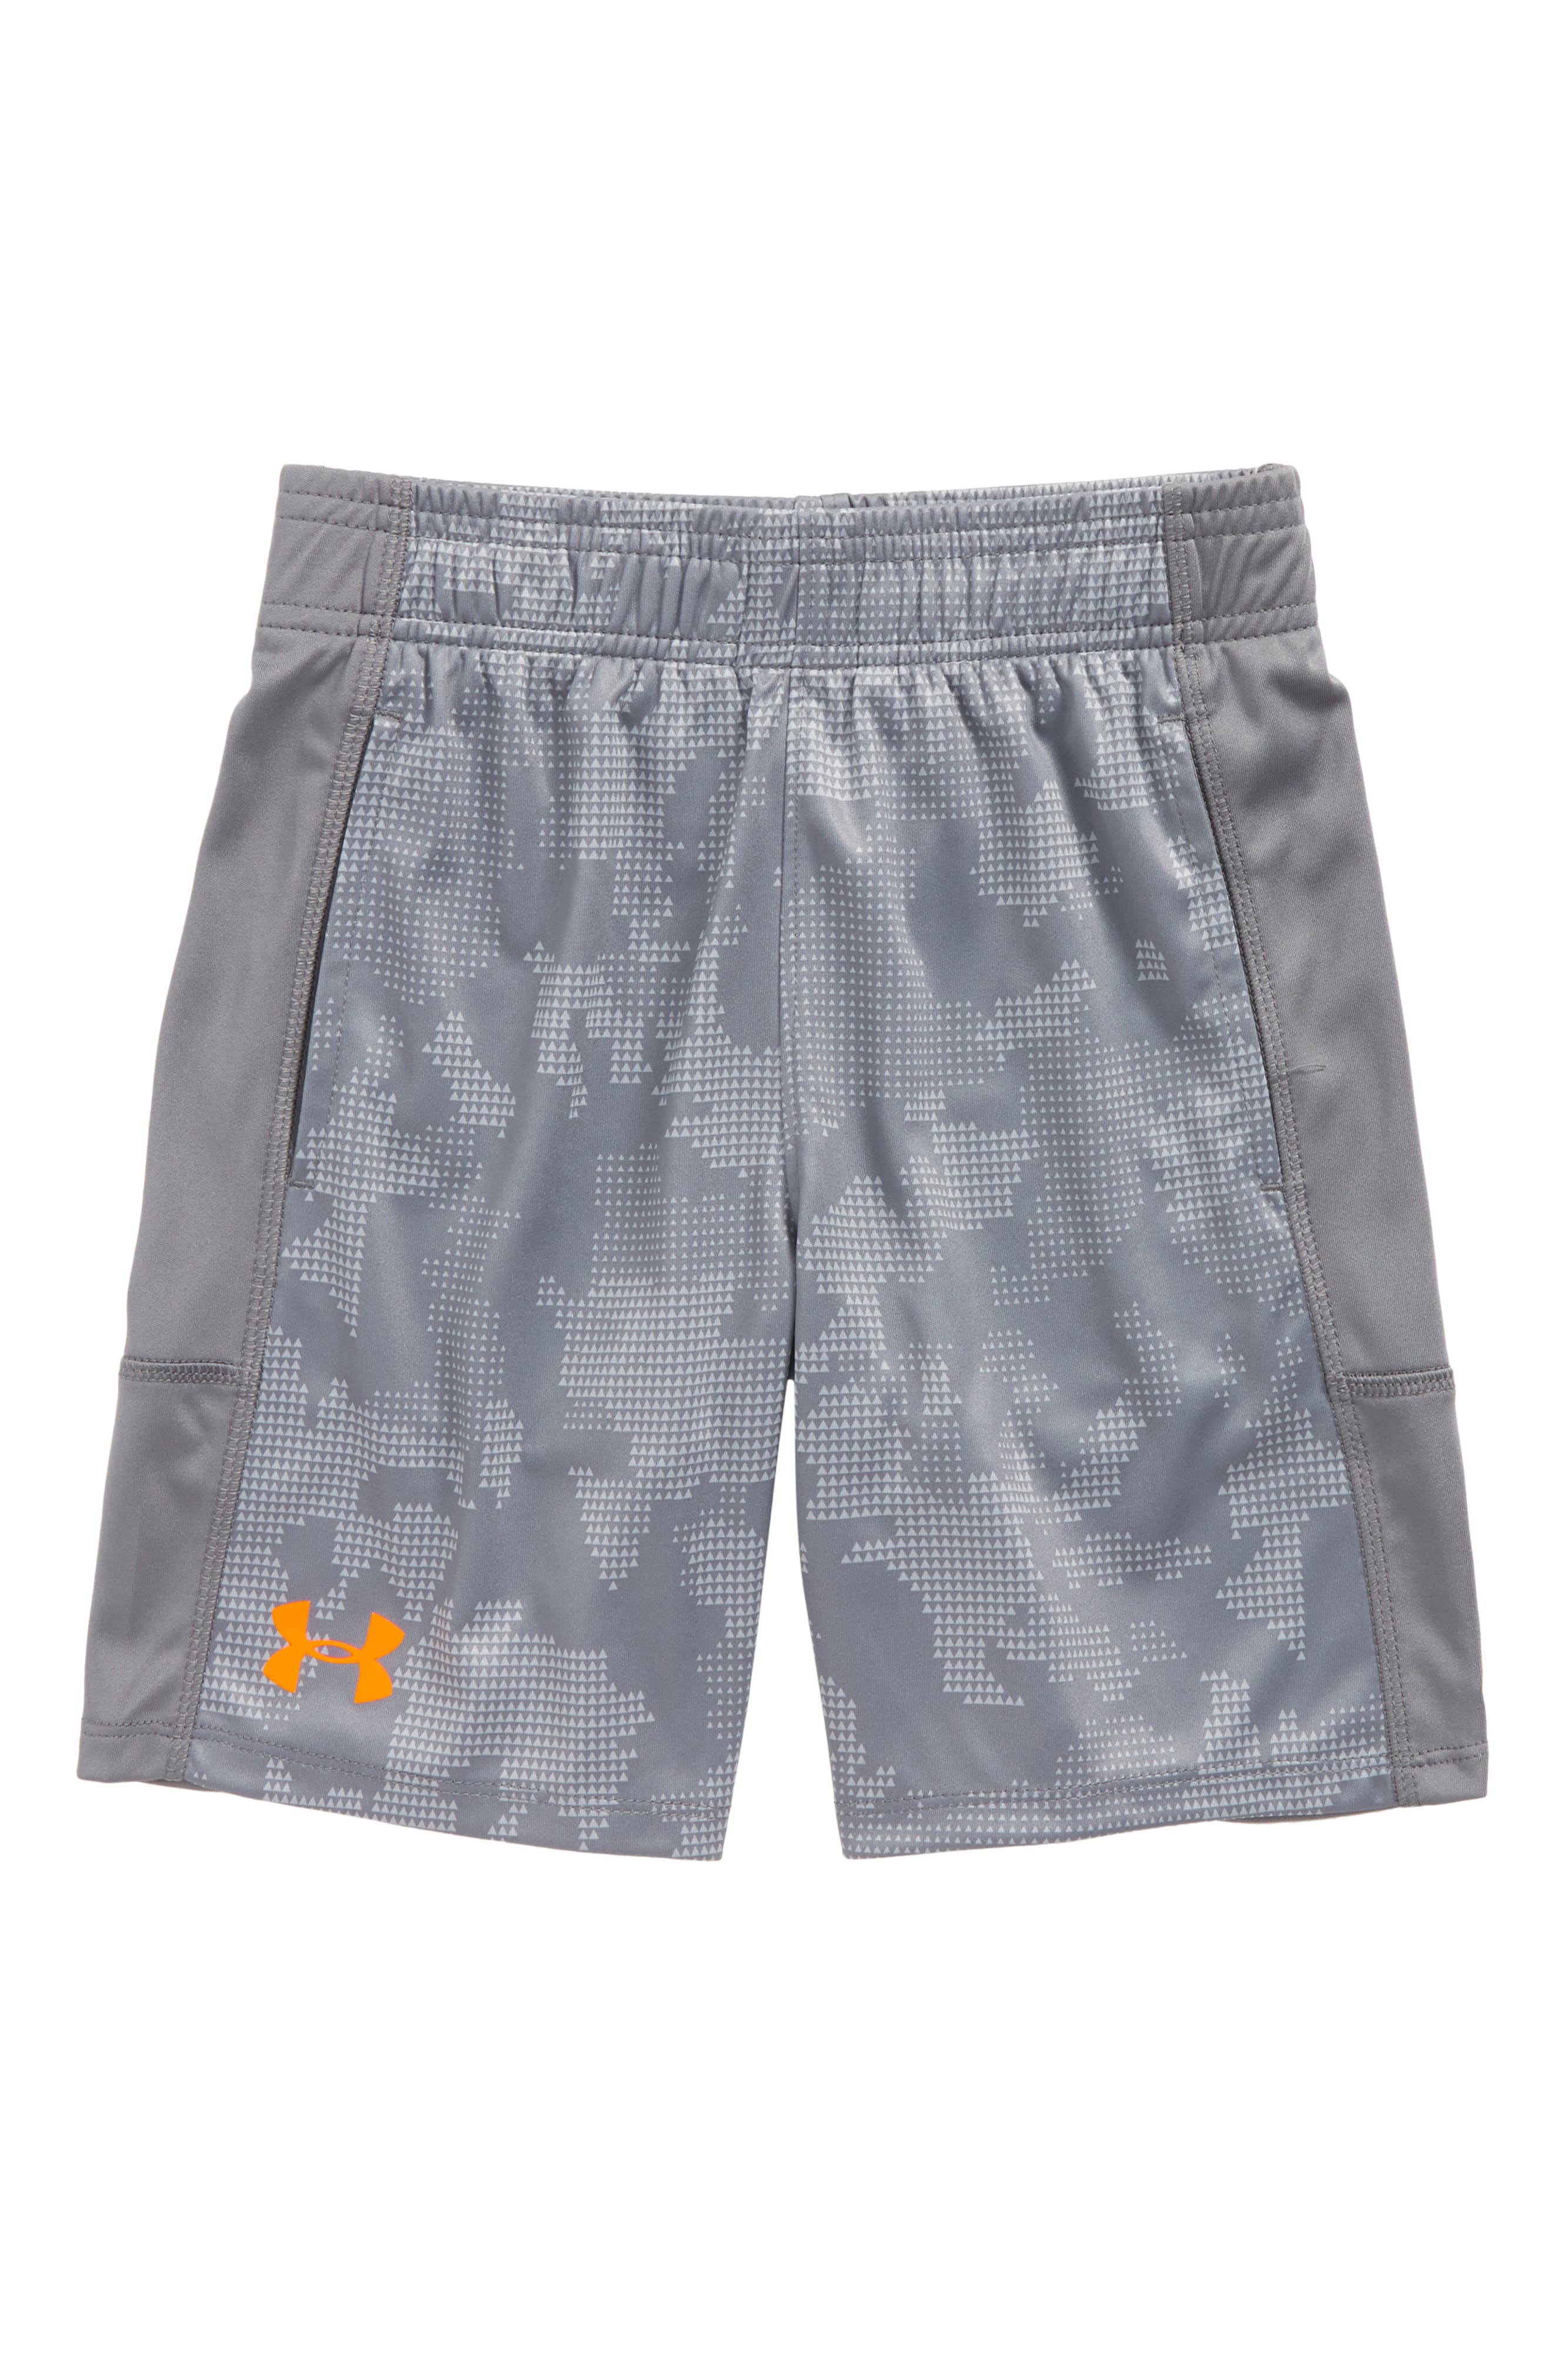 Alternate Image 1 Selected - Under Armour Stunt HeatGear® Shorts (Toddler Boys & LIttle Boys)